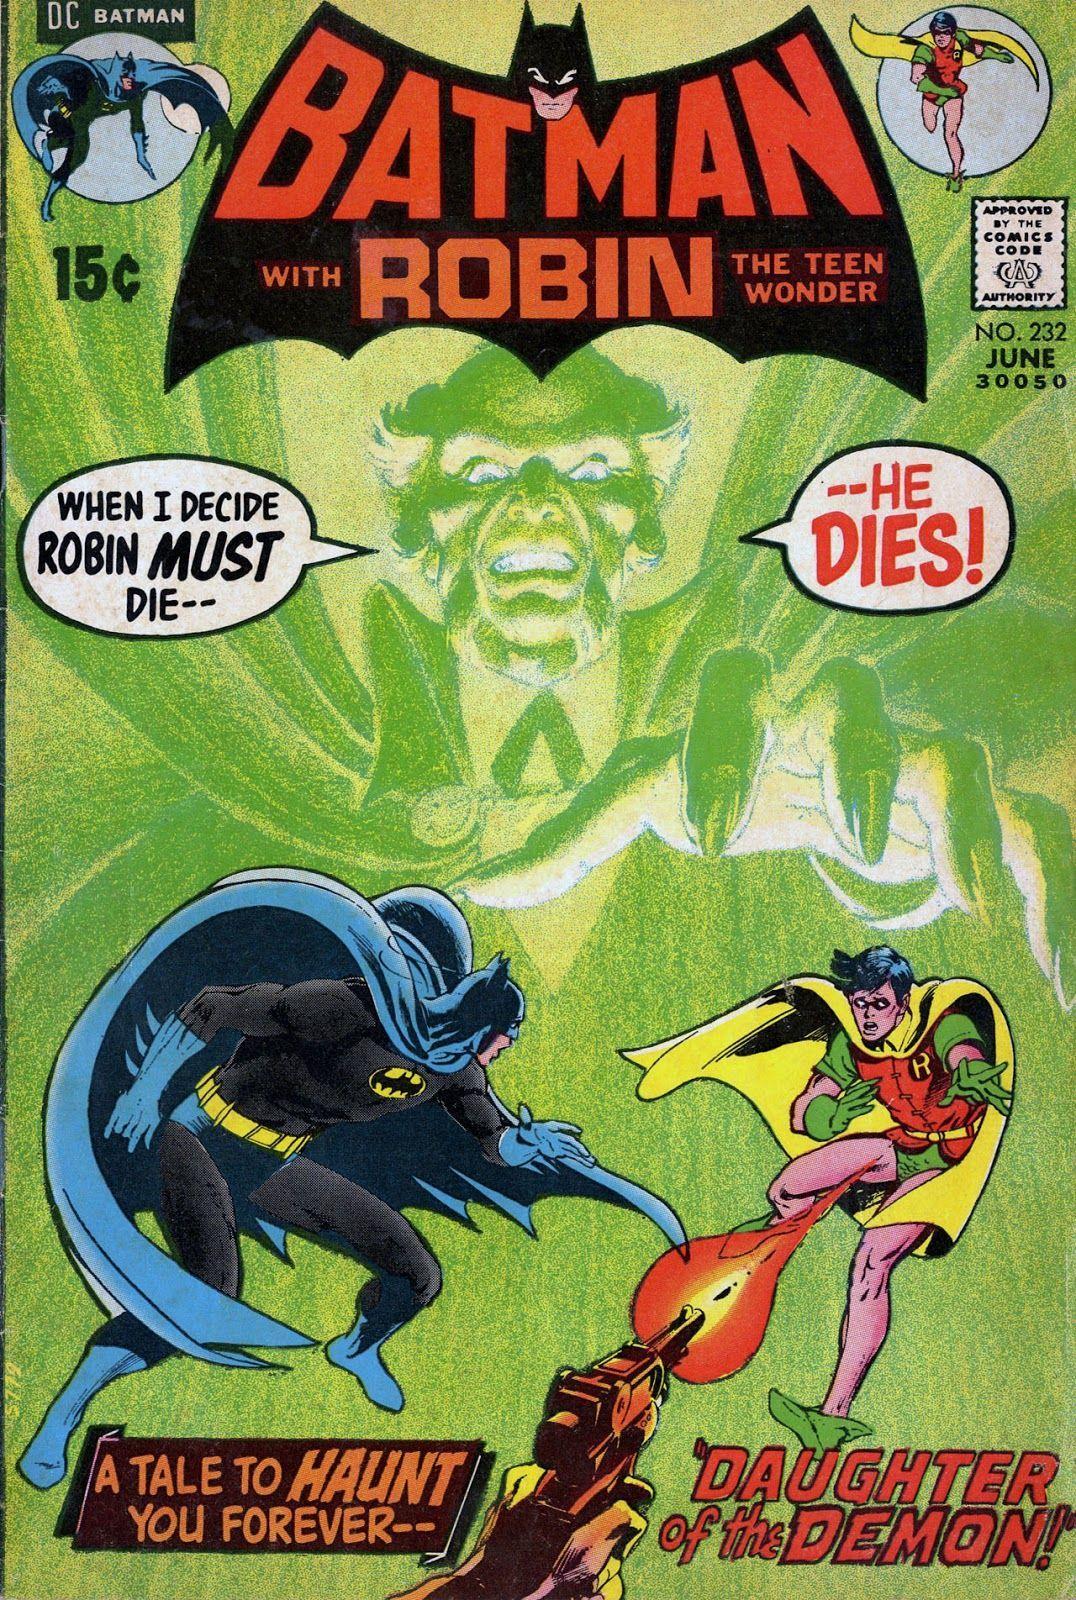 Batman #232 (Writer: Denny O'Neil, Art: Neal Adams)